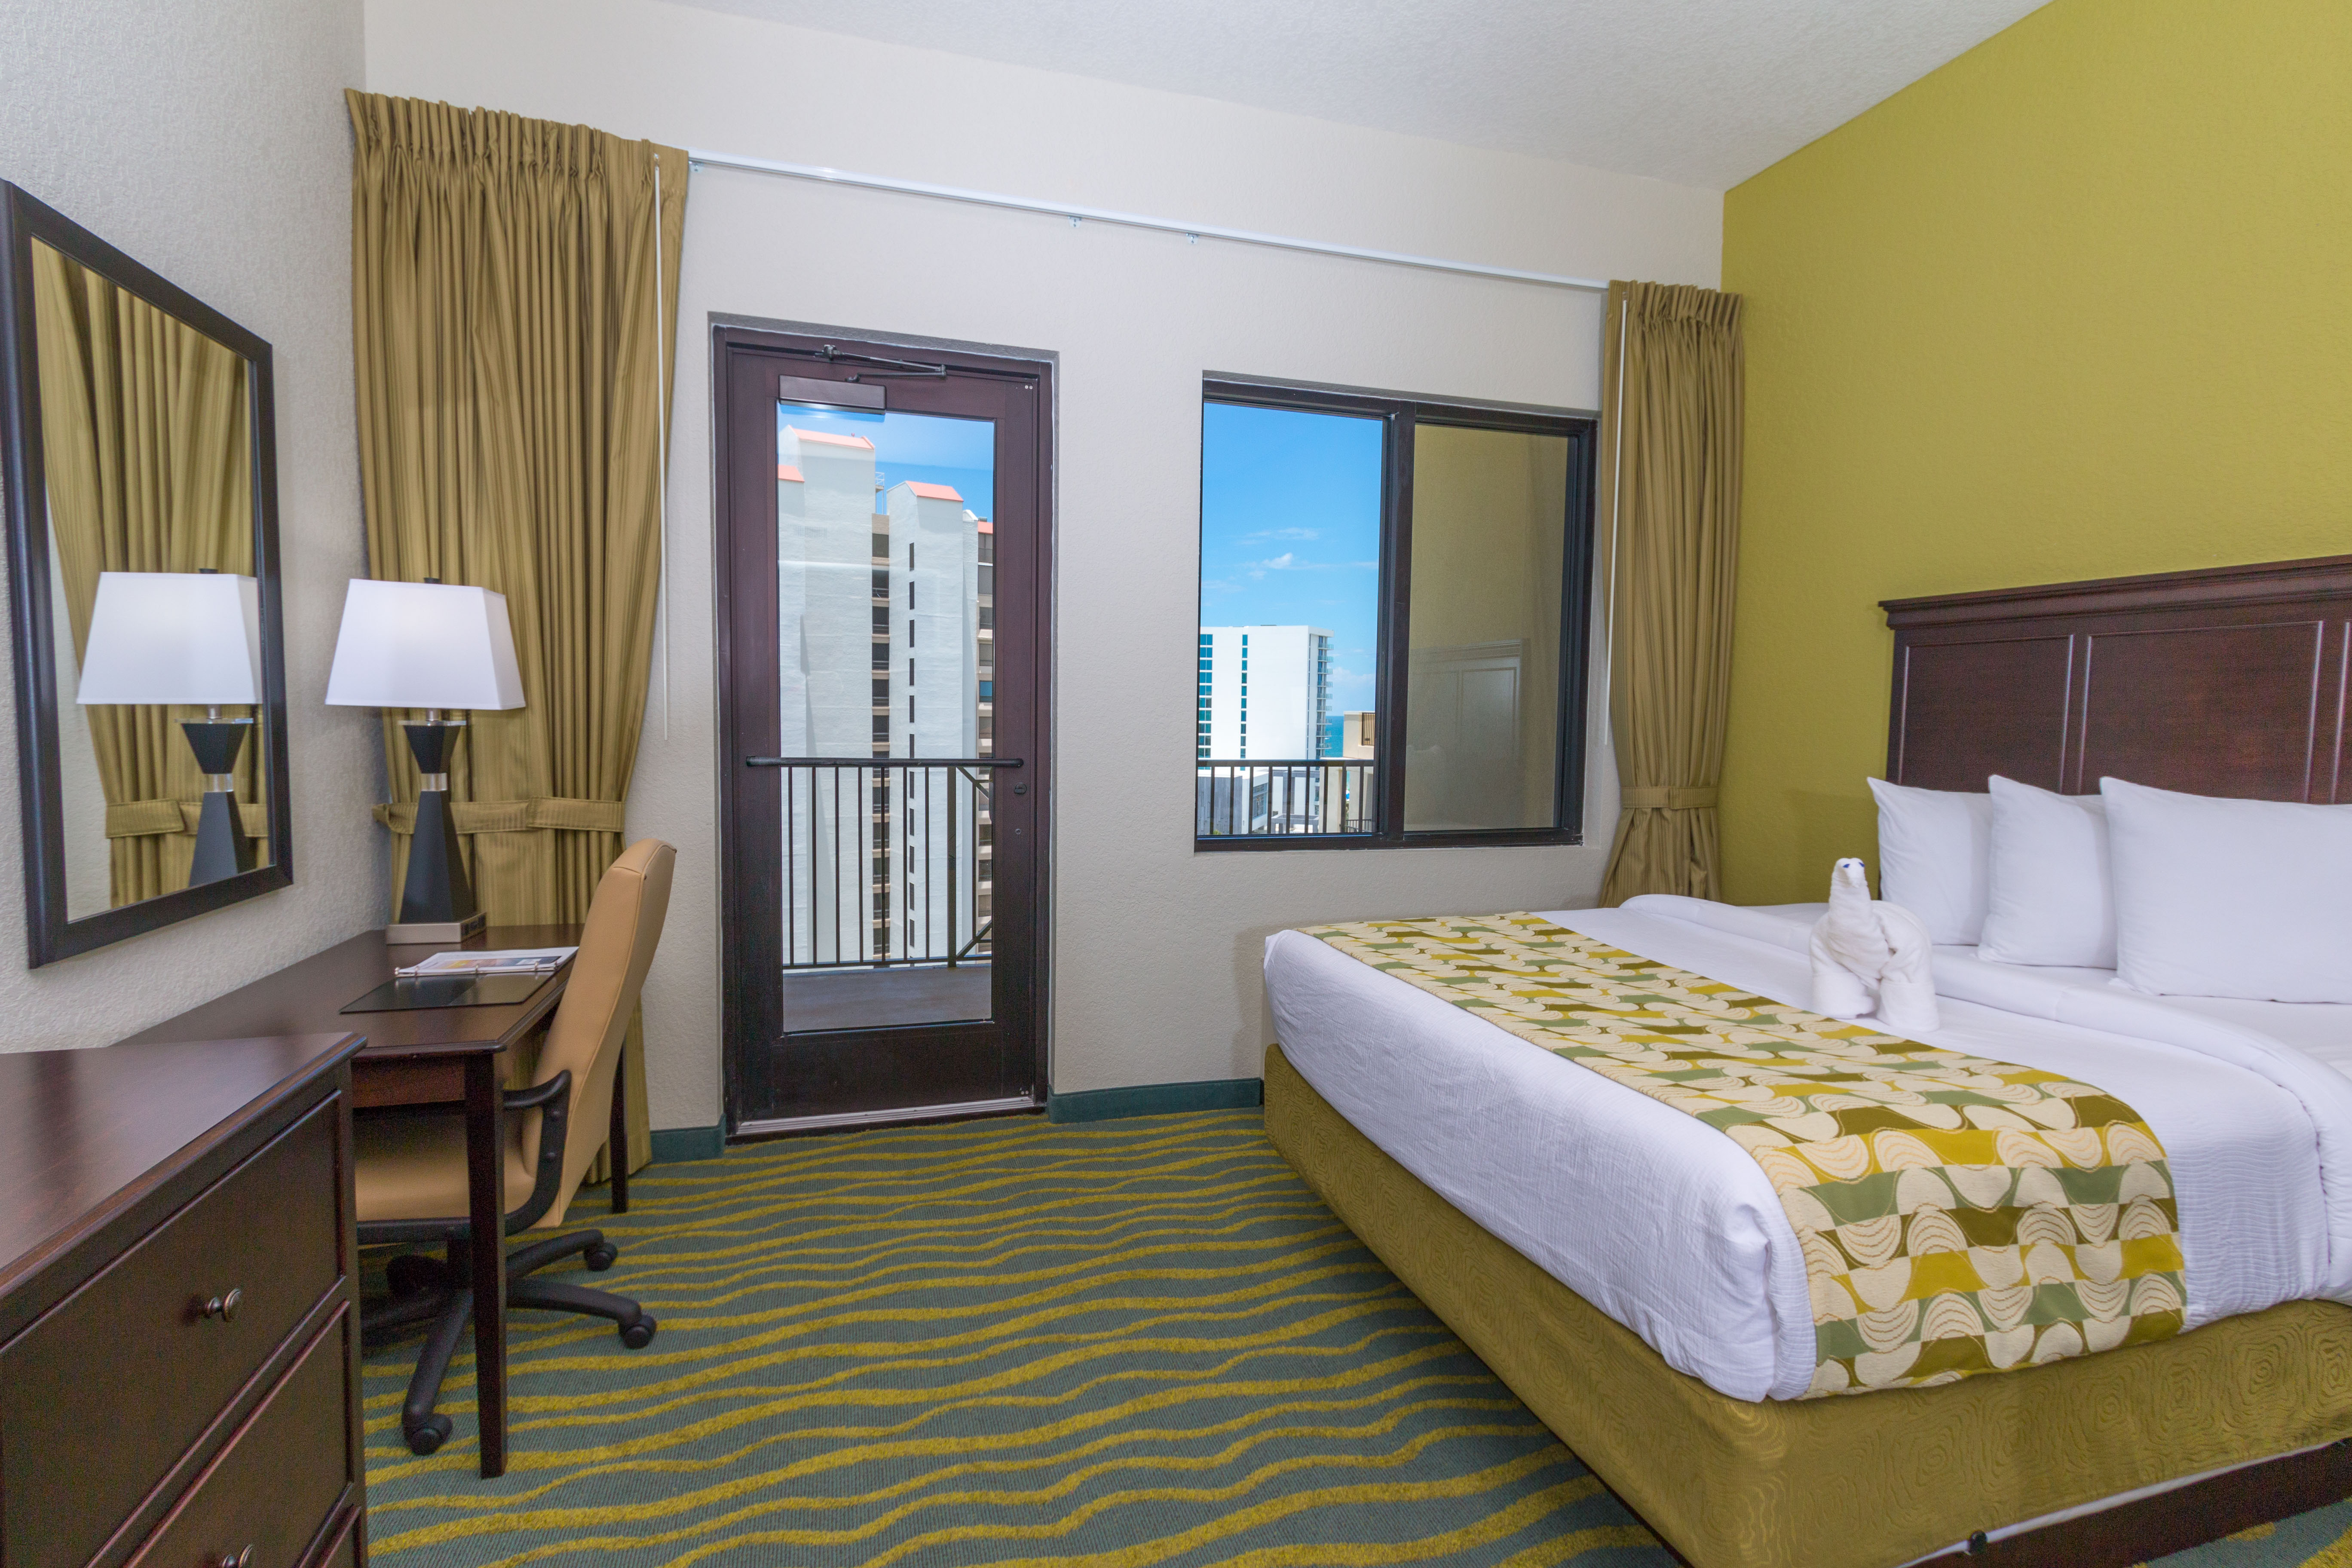 2 Bedroom Suites In Clearwater Beach Florida